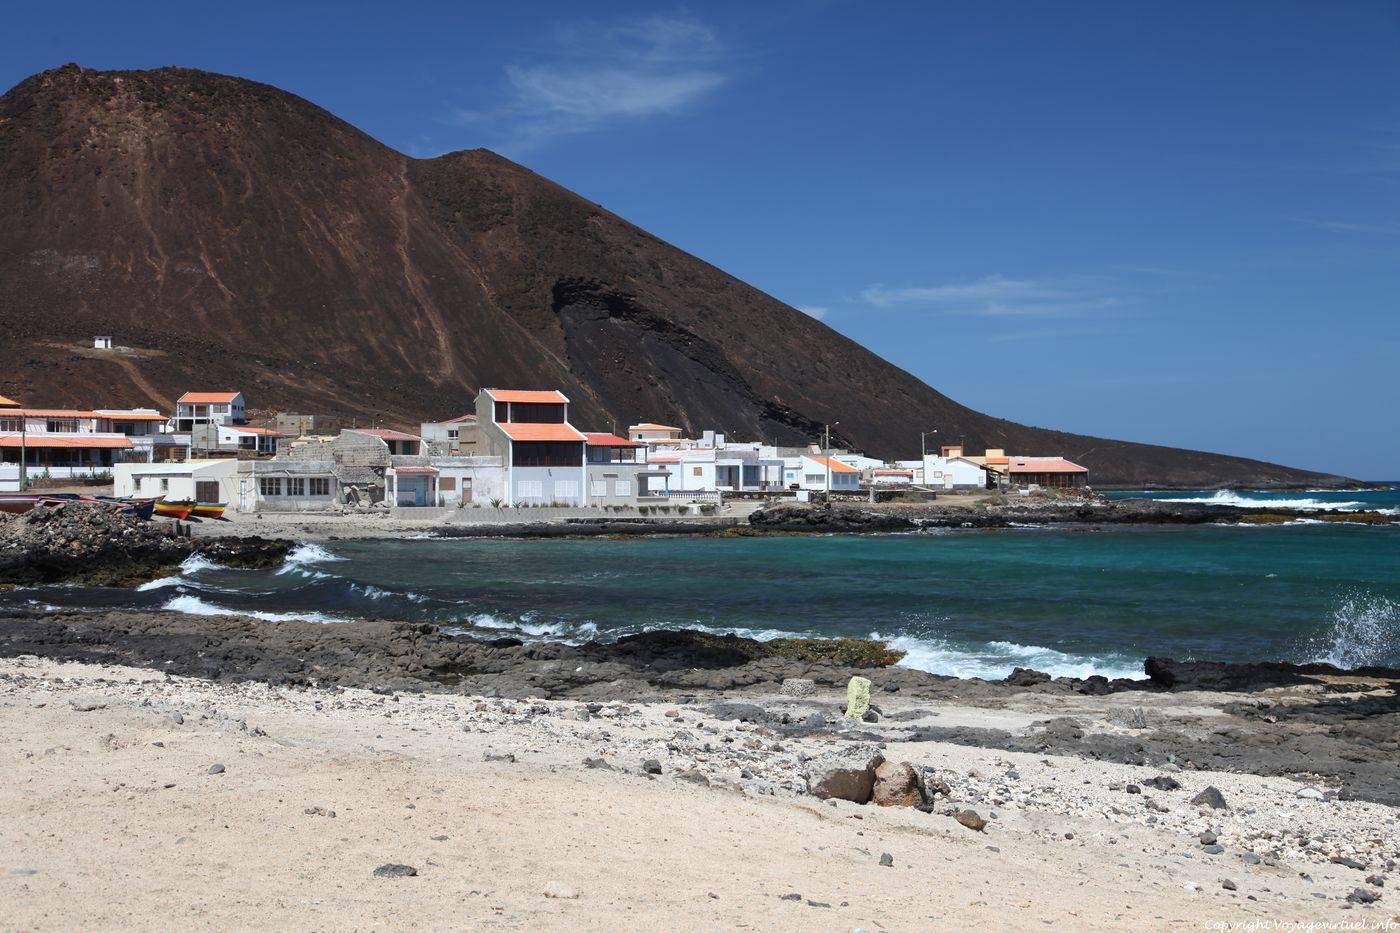 profiter du prix de liquidation style populaire design distinctif São Vicente, Calhau, village sea - Cape Verde